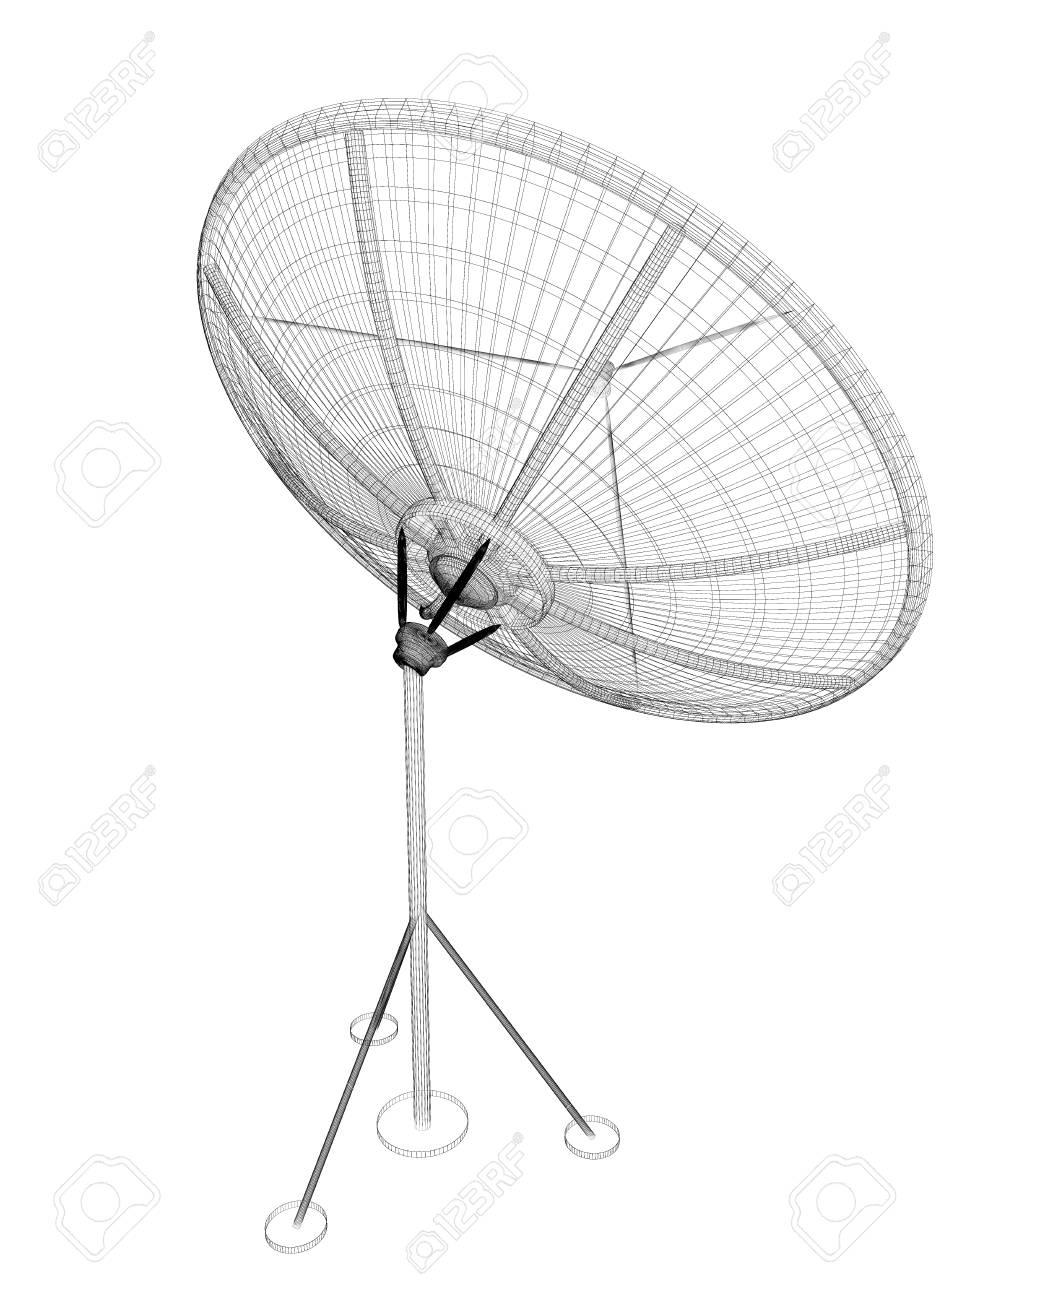 satellite tracking system satellite dish on the background stock Television Antenna Satellite Dish satellite tracking system satellite dish on the background stock photo 59883155